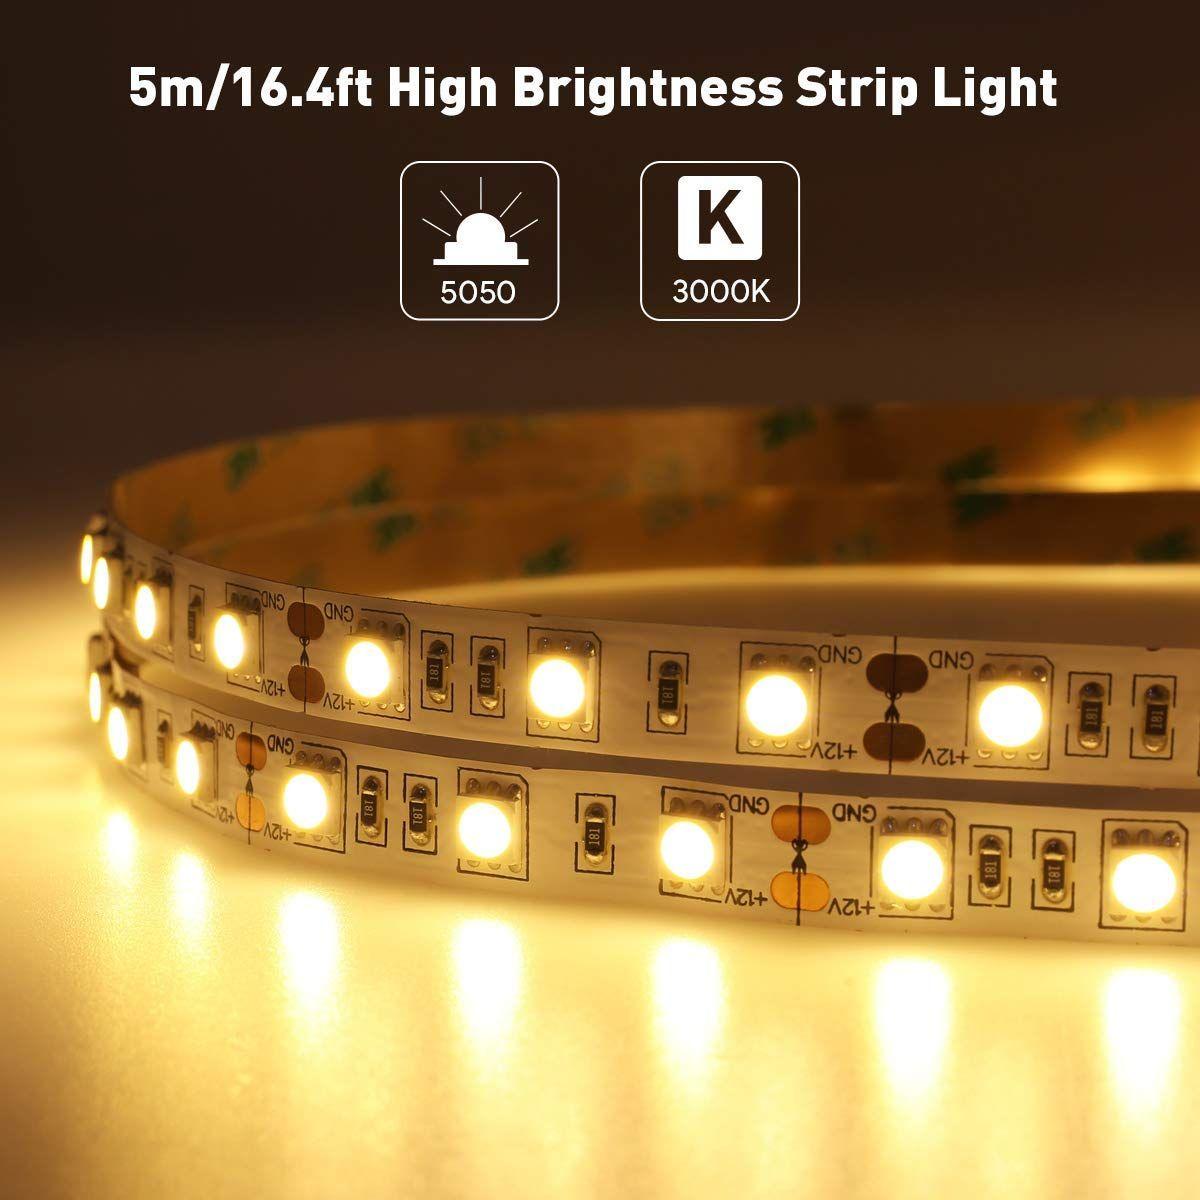 Led Strip Lights Smd5050 Warm White 3000k 16 4ft For Christmas Decor Strip Lighting Led Strip Lighting Led Tape Lighting